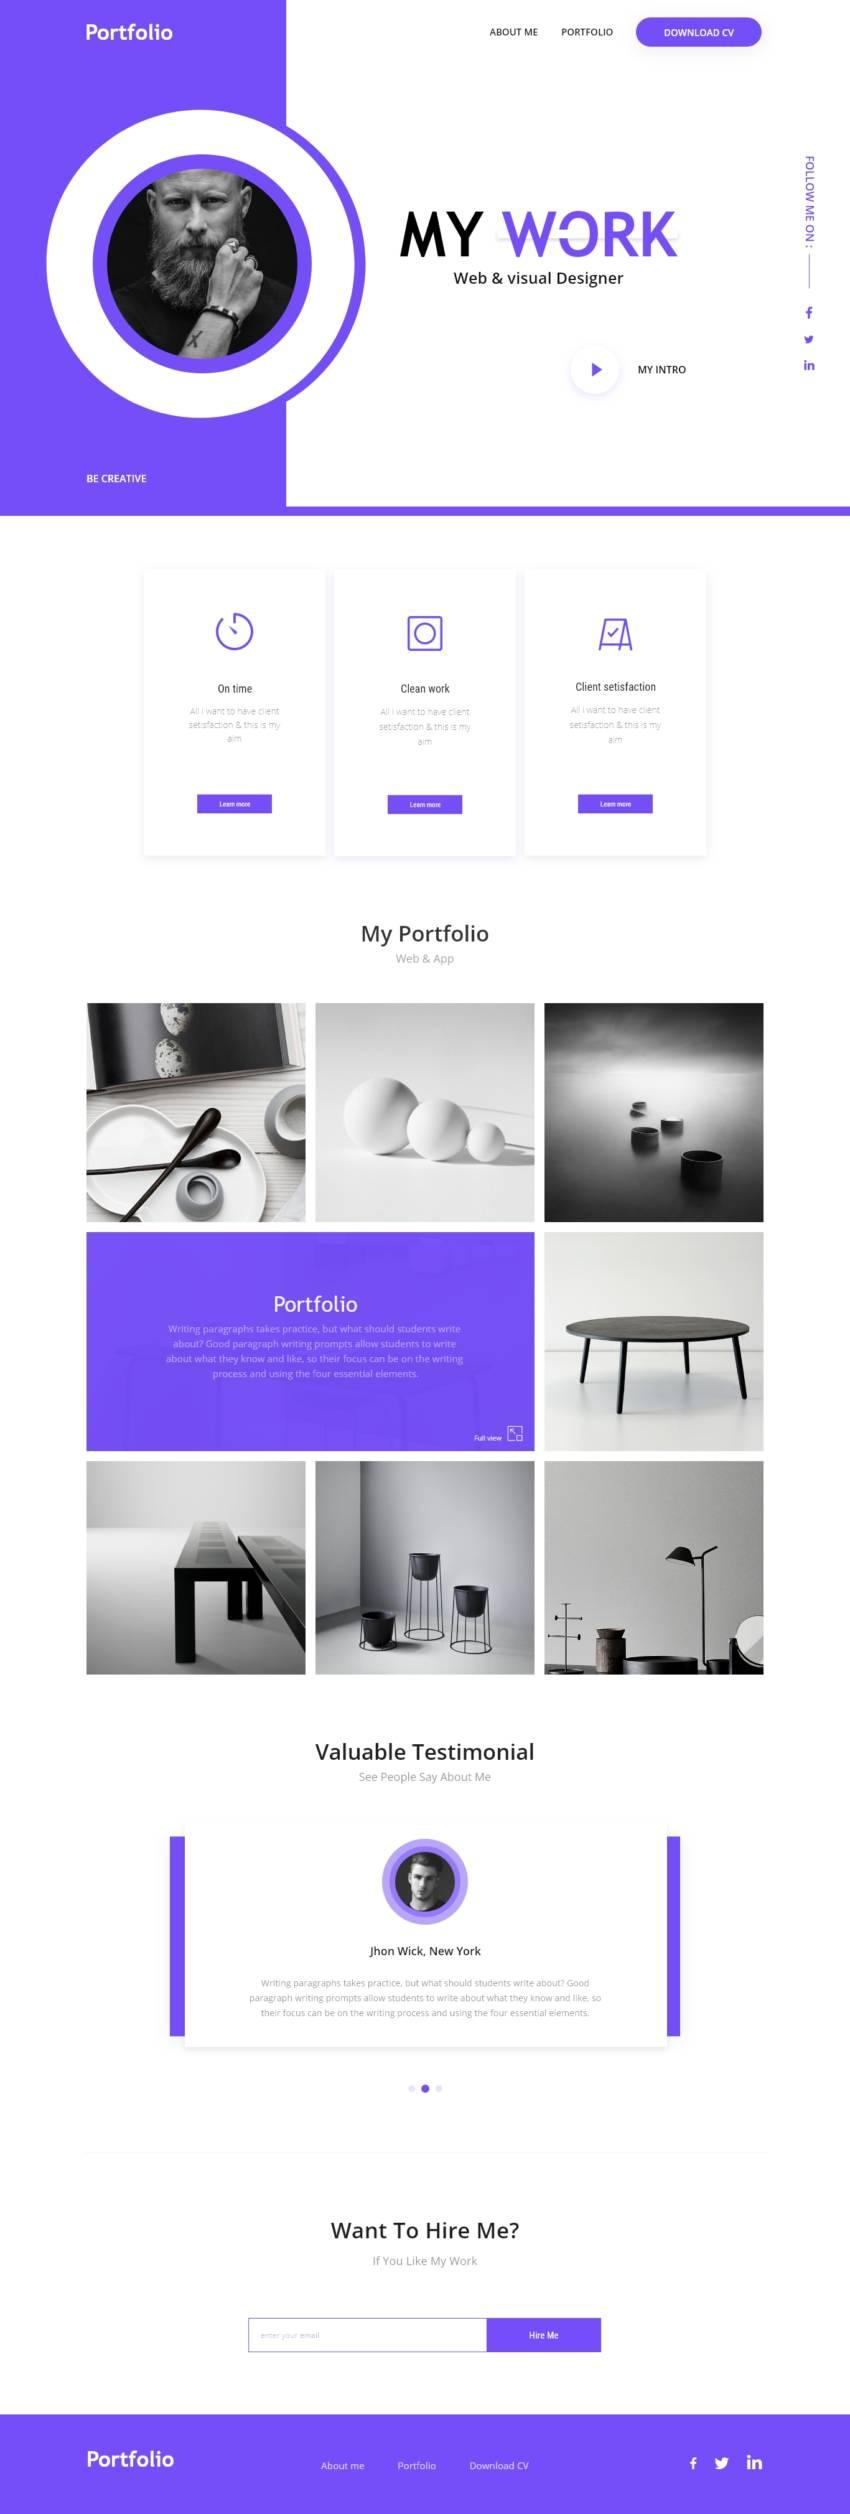 Personal Portfolio template (.Xd) скачать бесплатно